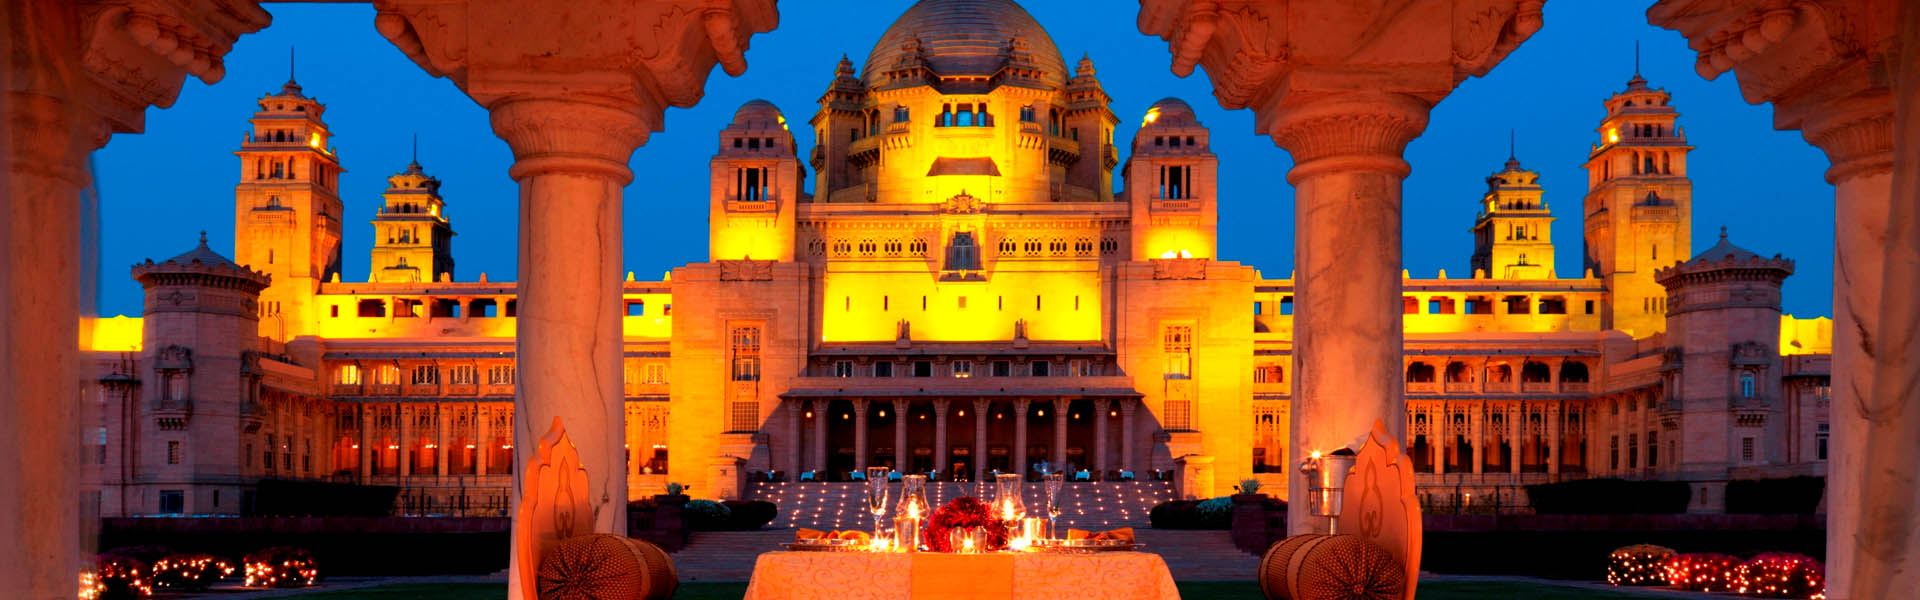 Diwali Celebration in Jaipur, diwali india, diwali, diwali celebration